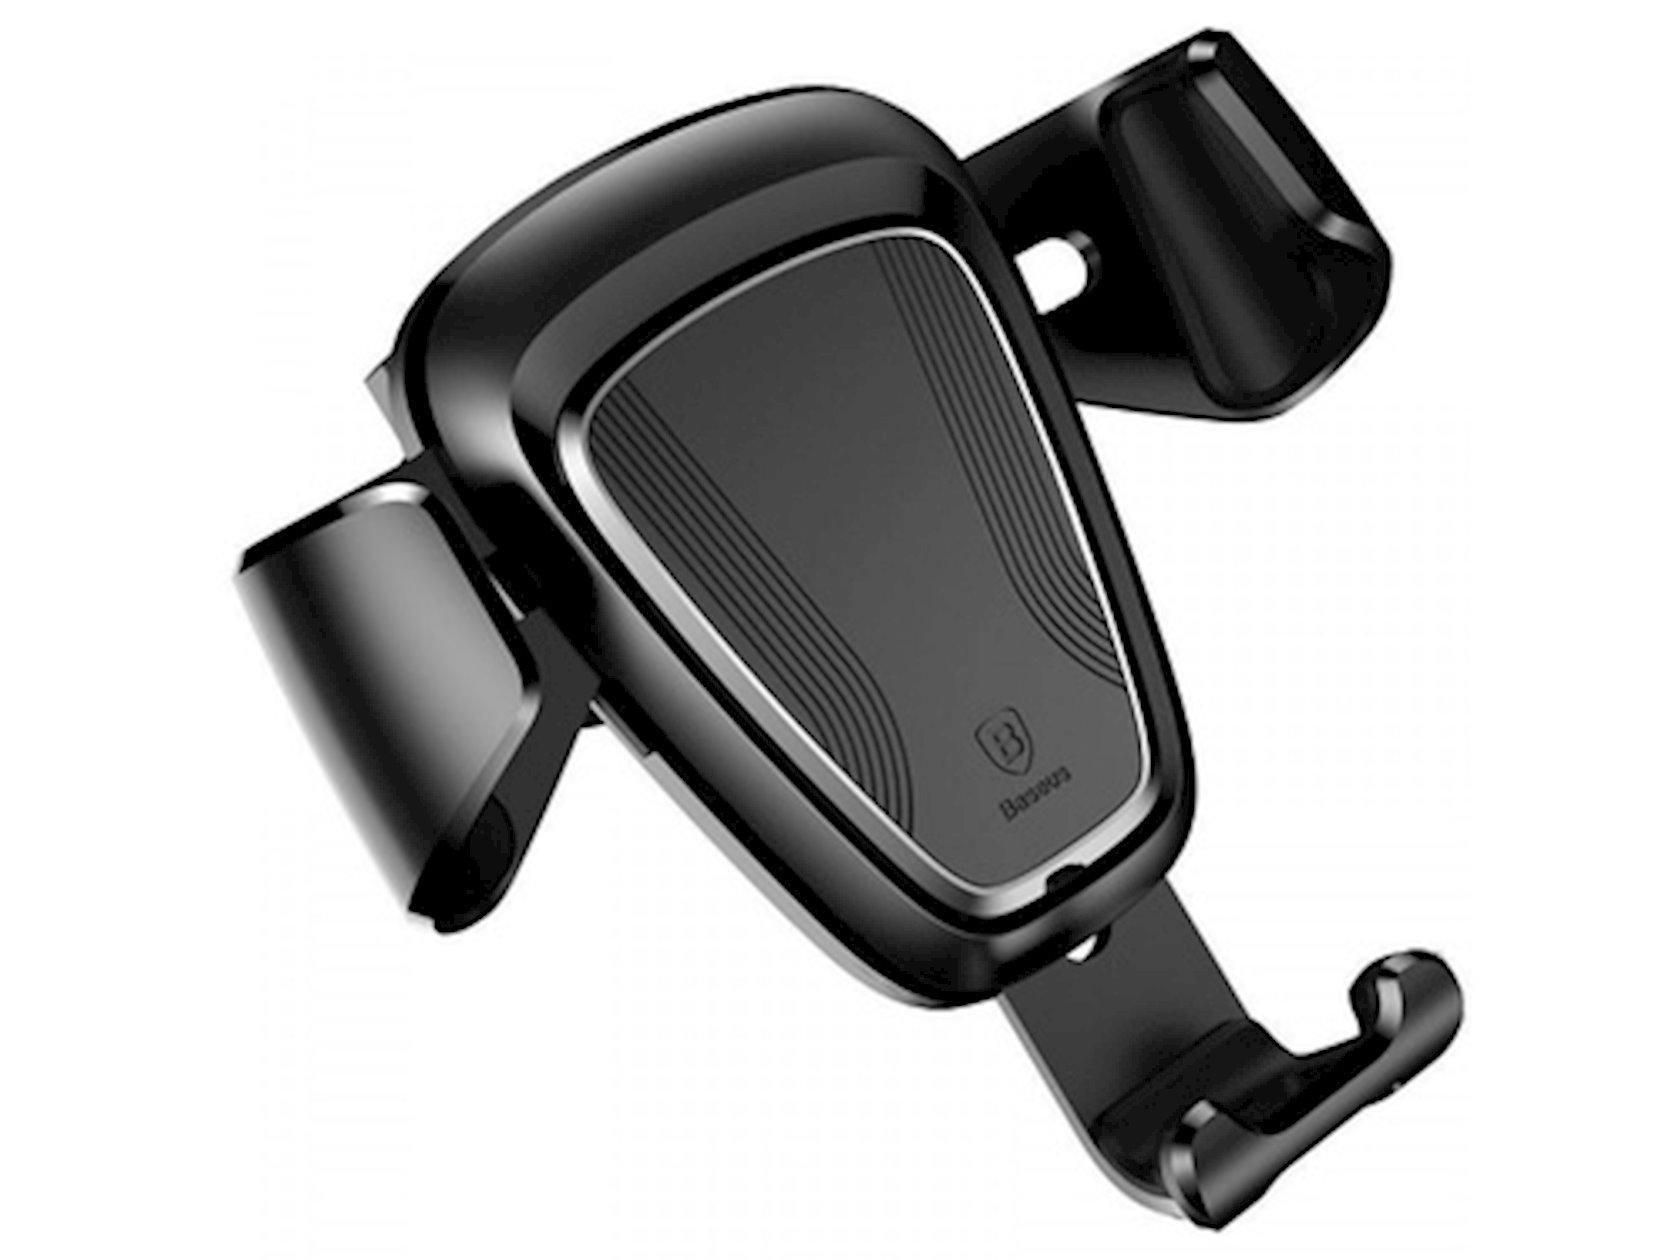 Avtotutacaq telefon üçün Baseus Gravity Car Mount Metal type SUYL-B01 Qara